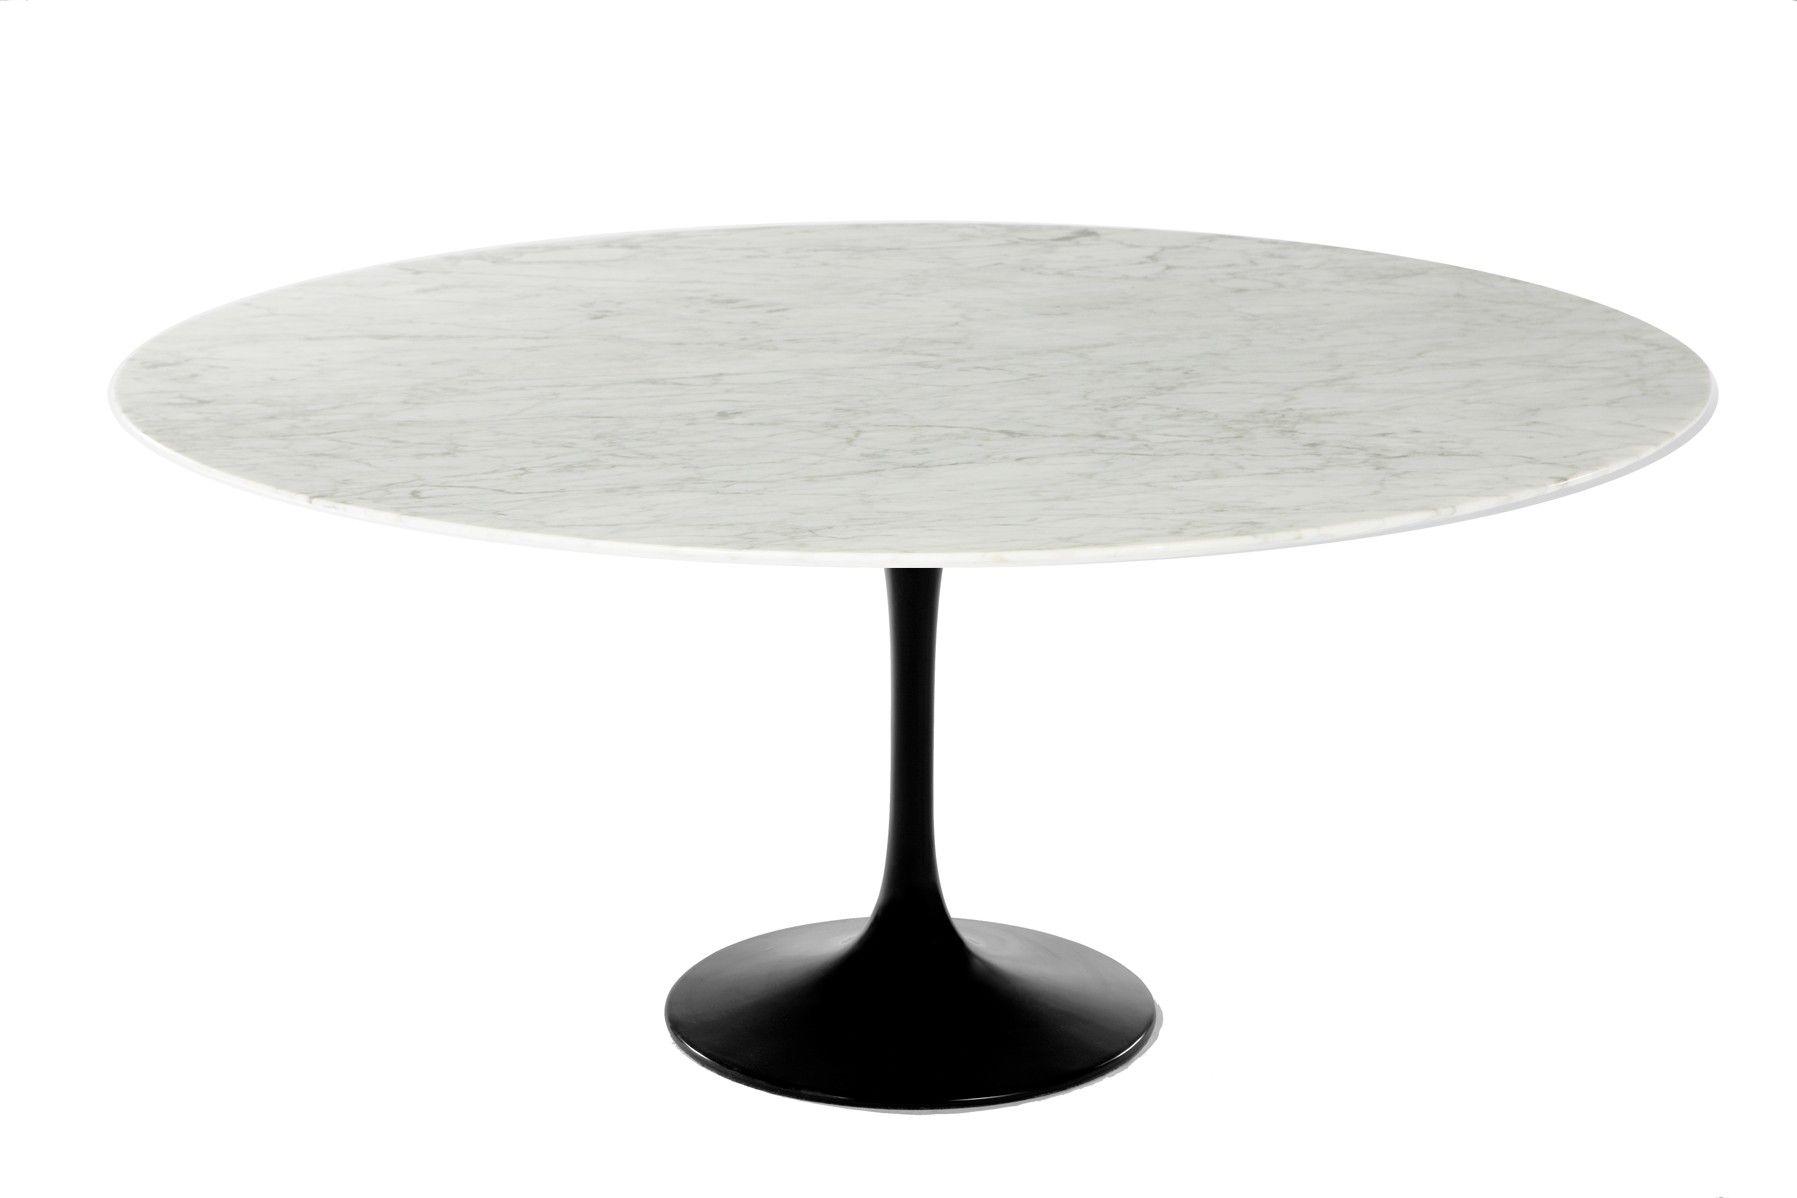 Saarinen 60 Oval Marble Tulip Dining Table Oval Marble Dining